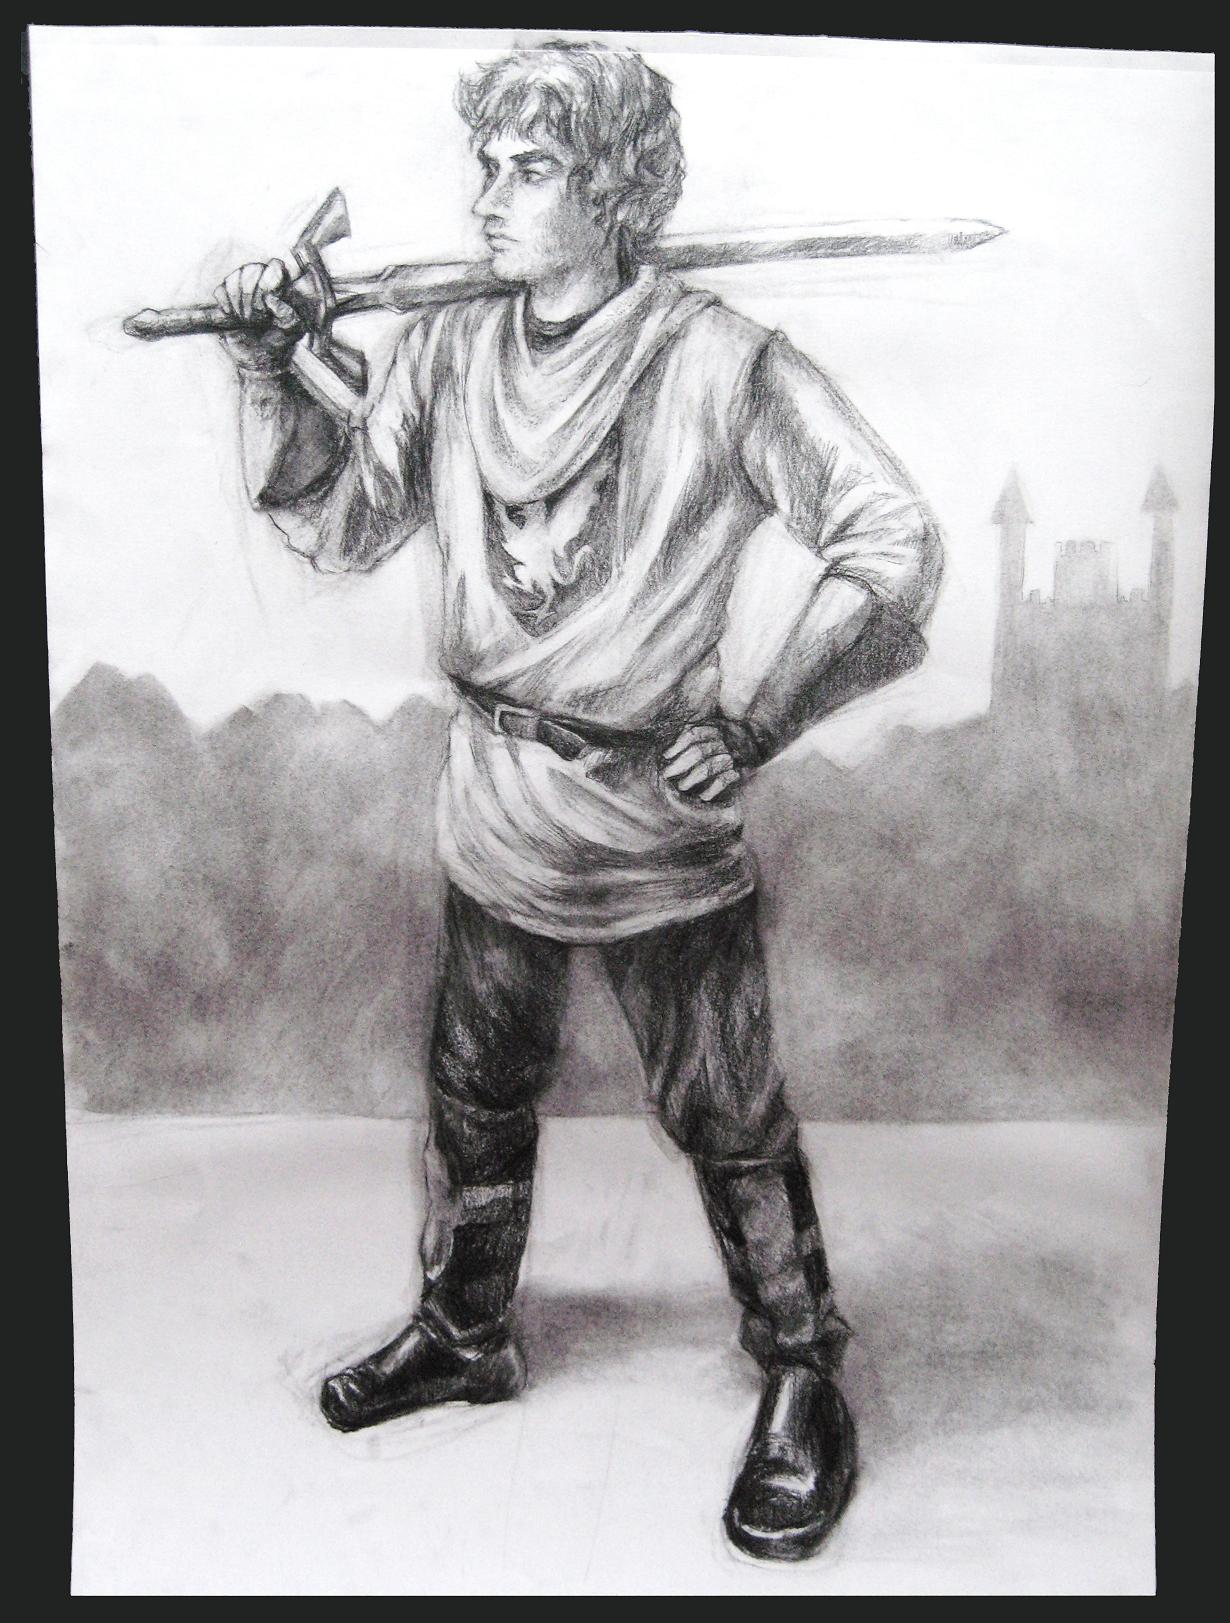 Griffin: Swordsman